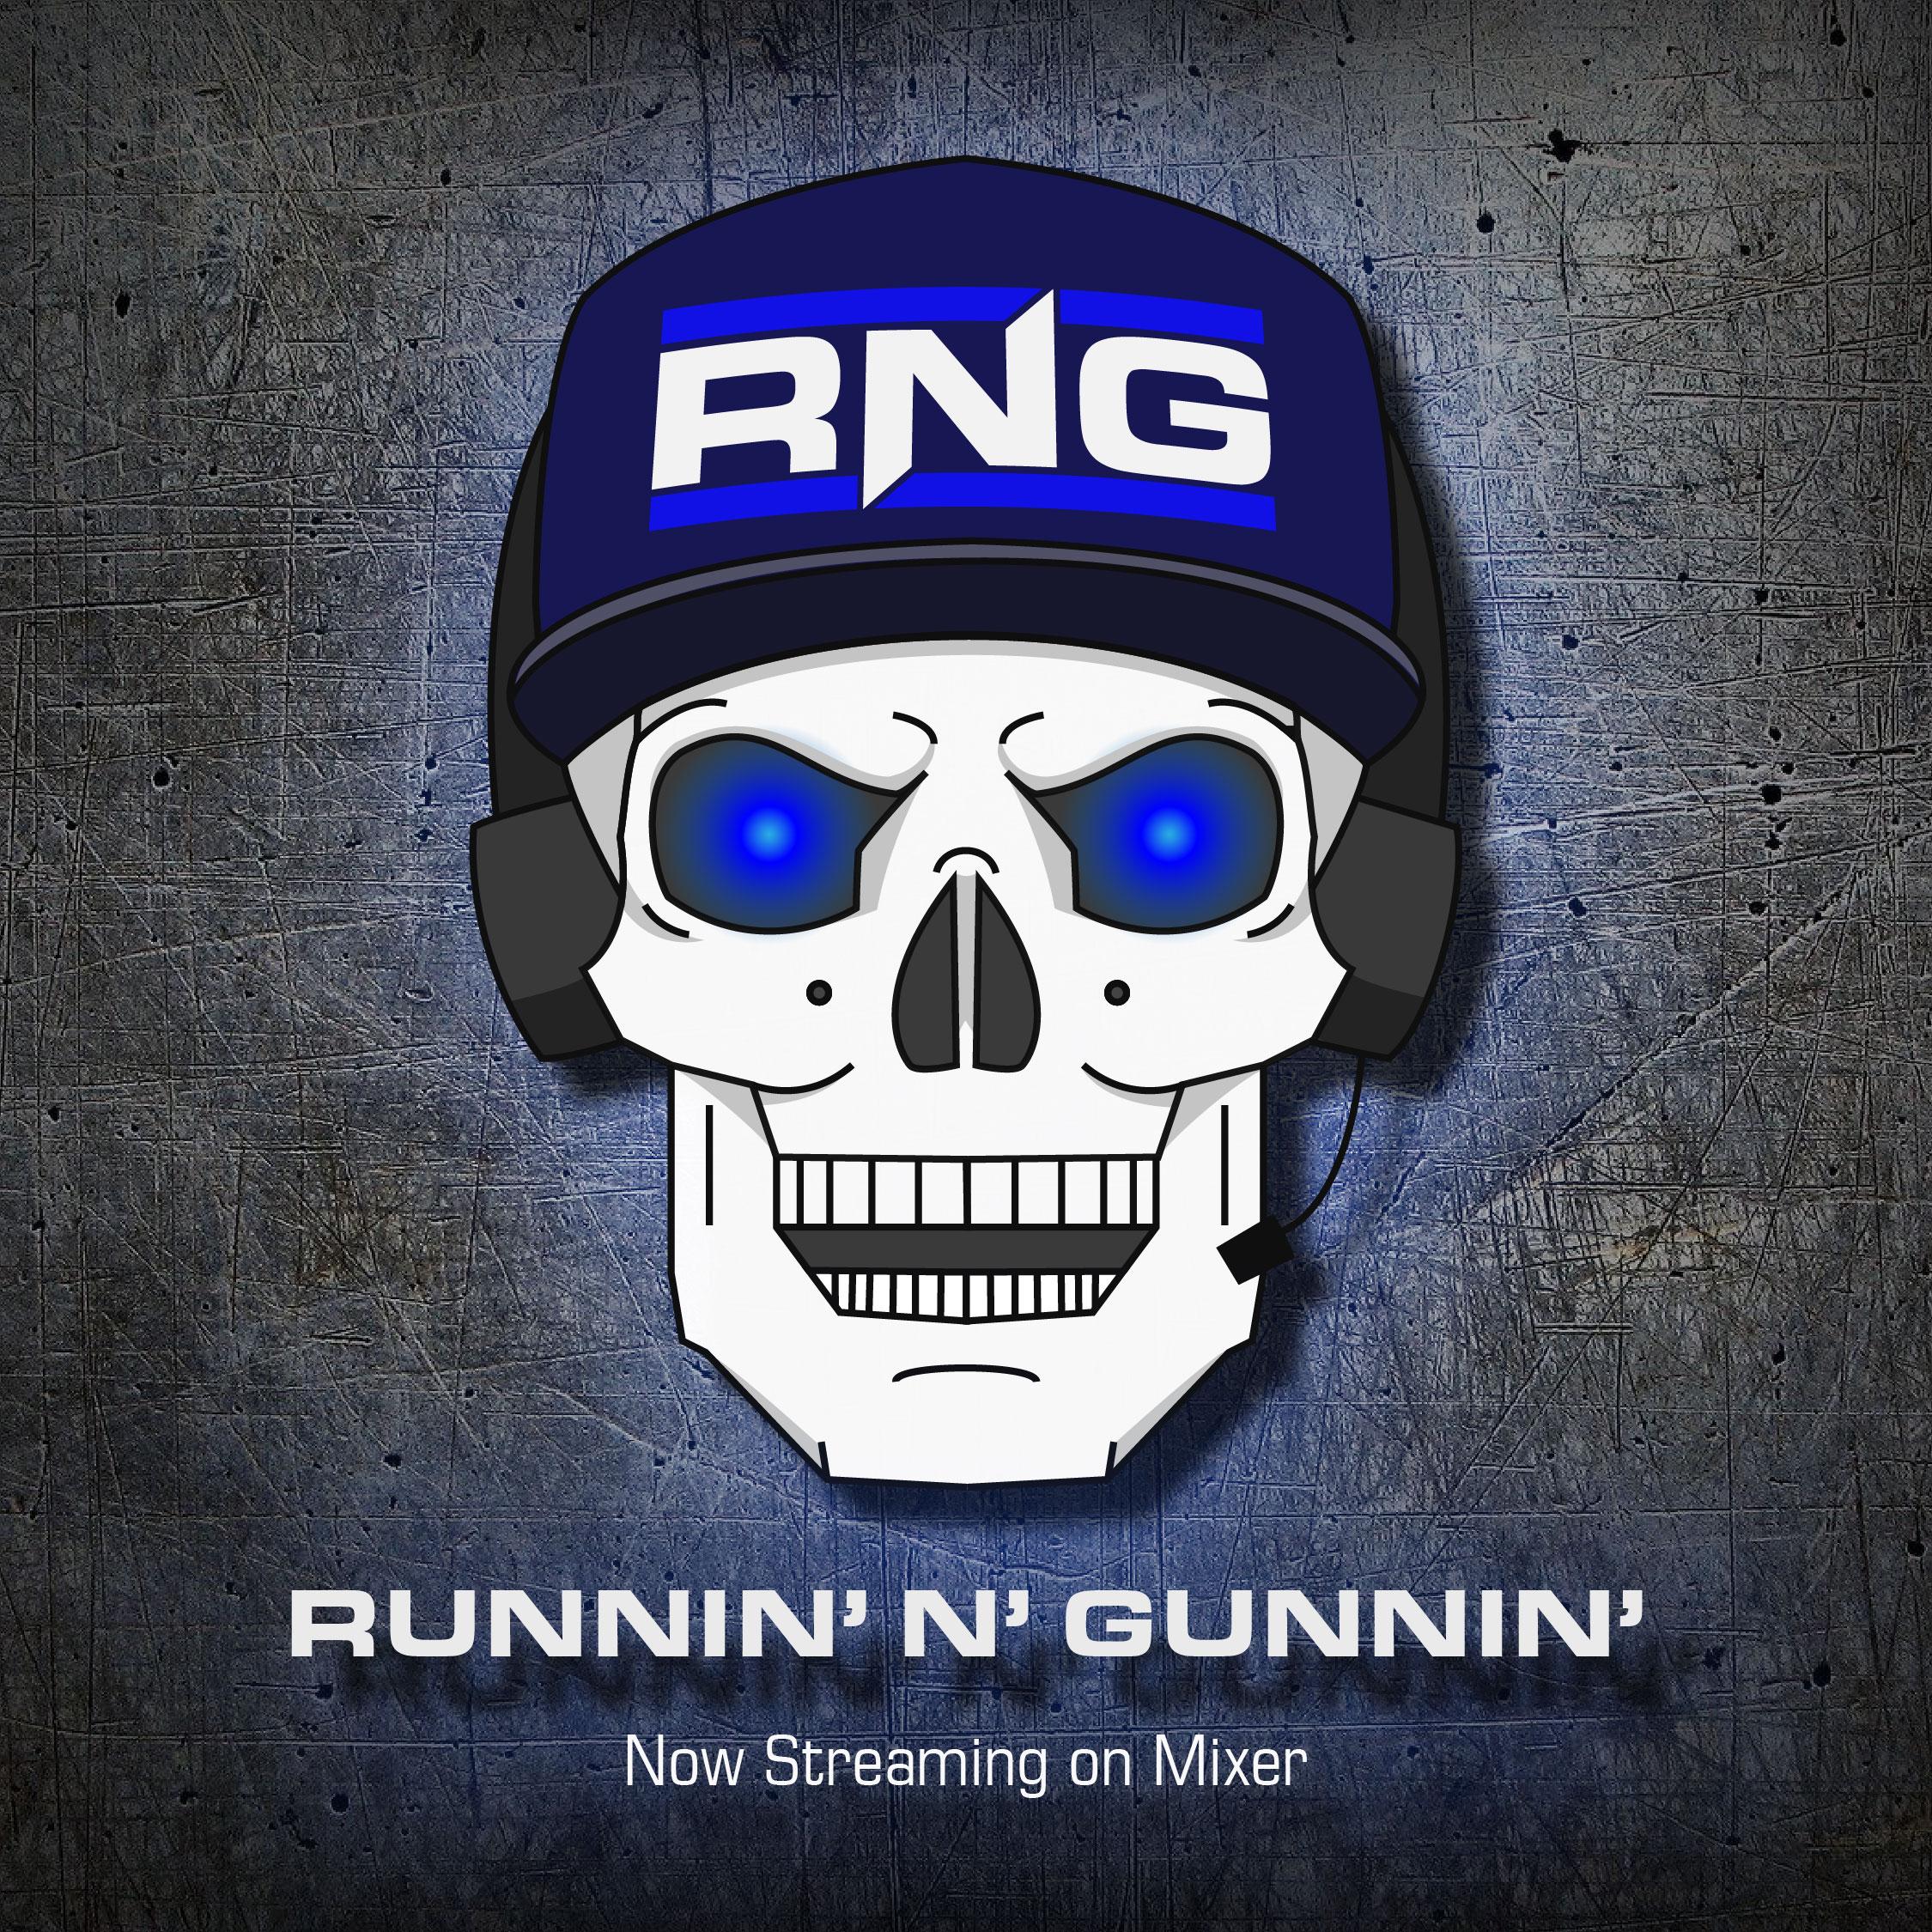 RNG Logo, 2018, Adobe Illustrator